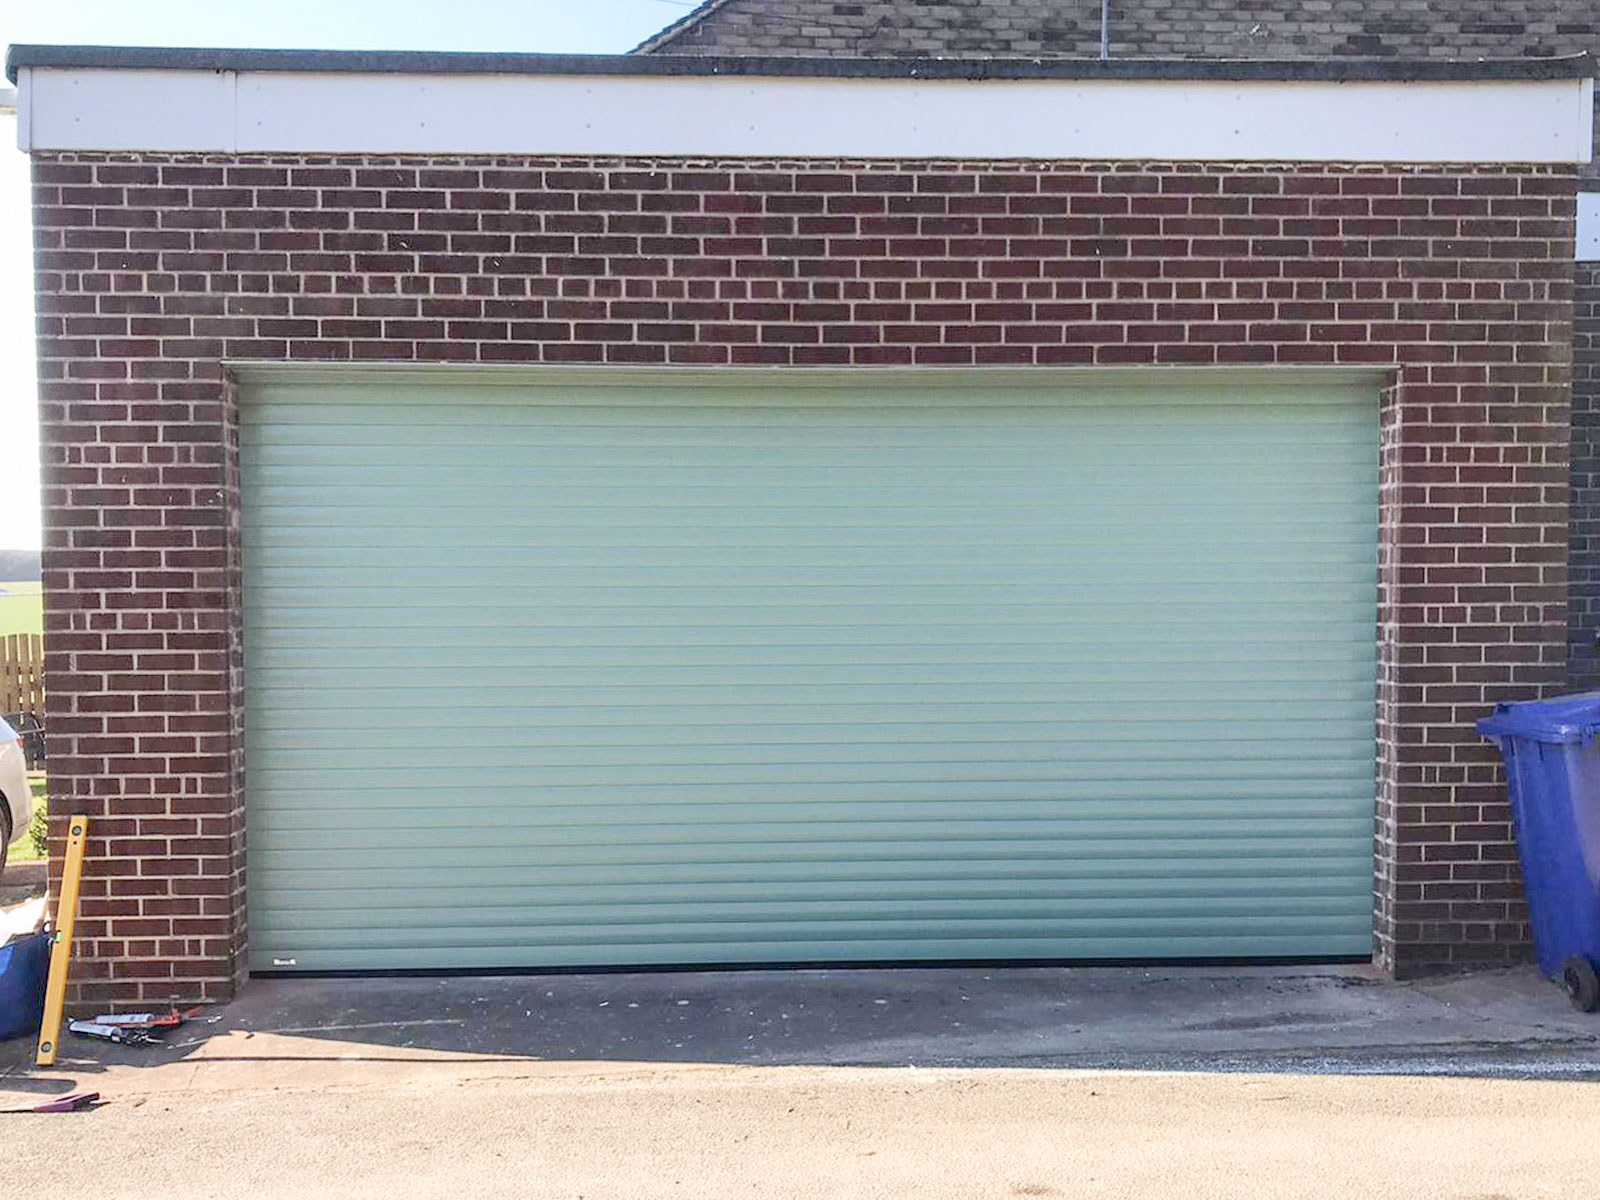 Chartwell Green Insulated Roller Garage Door, Bolton